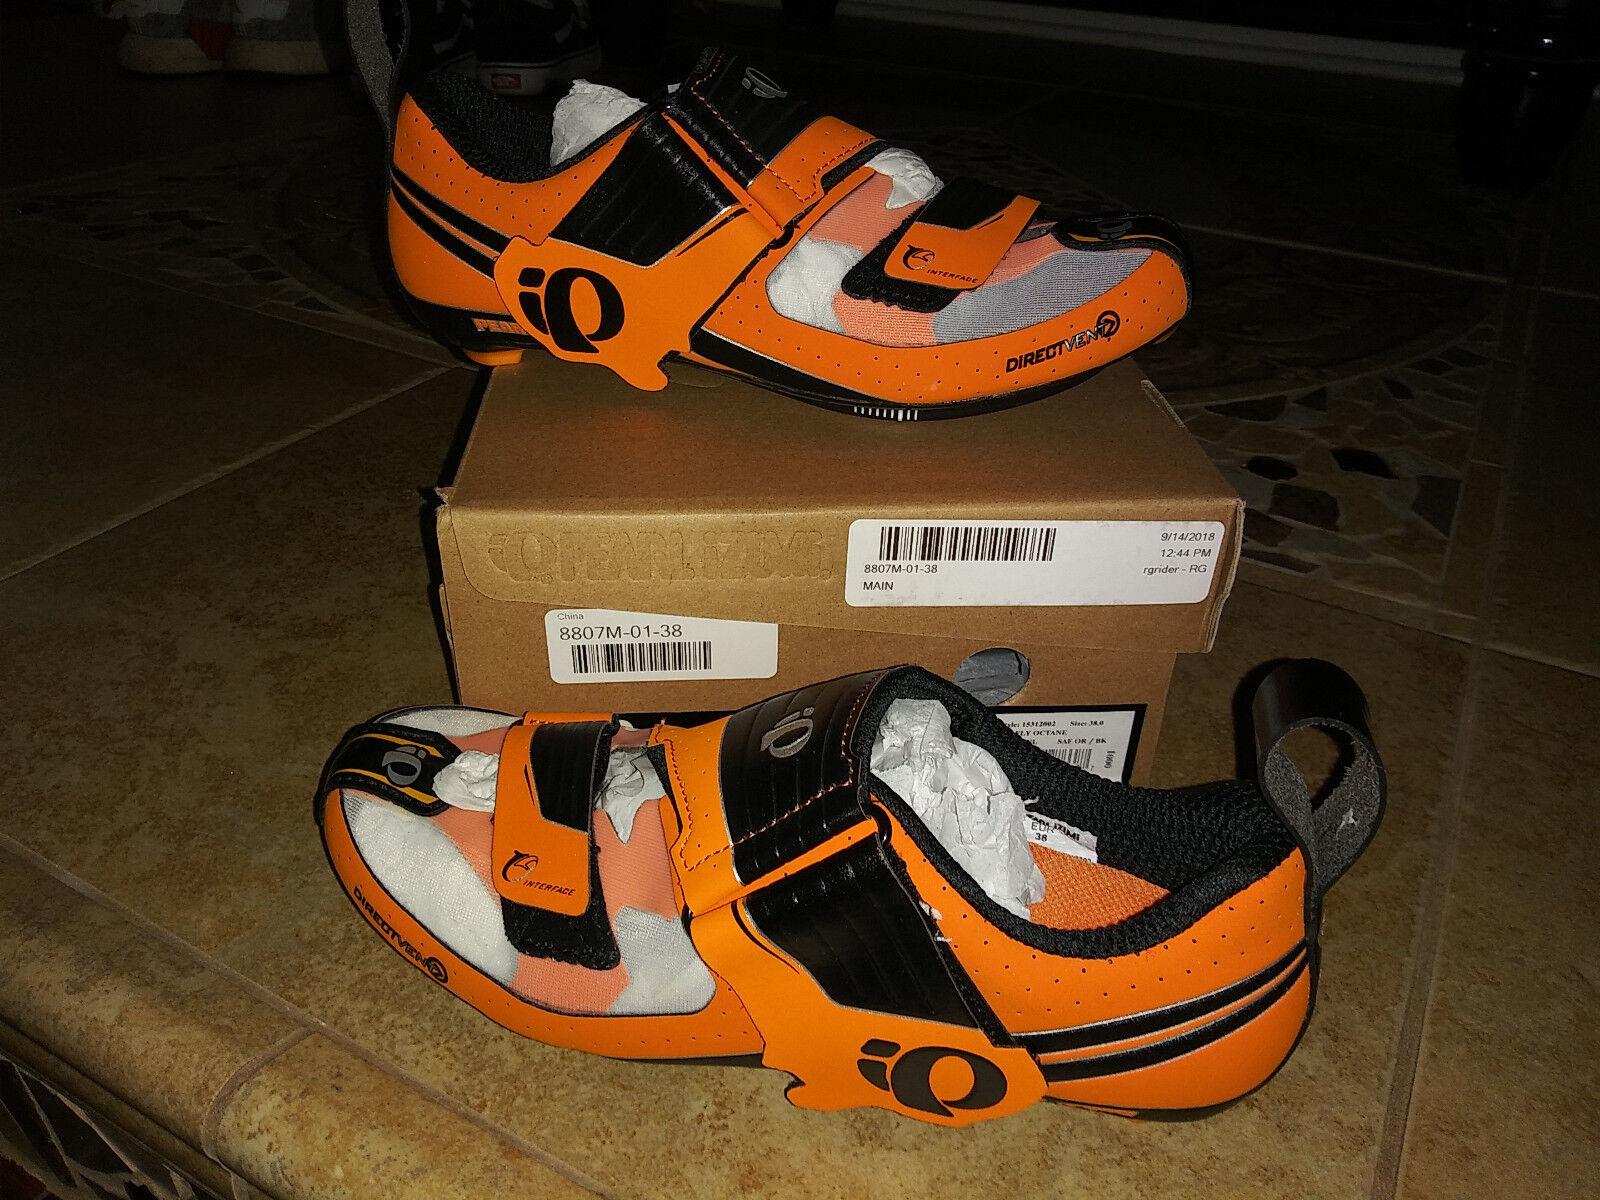 Nuevo  Para hombres Zapatos para Perla Izumi Tri Fly Octane, tamaño 38.0